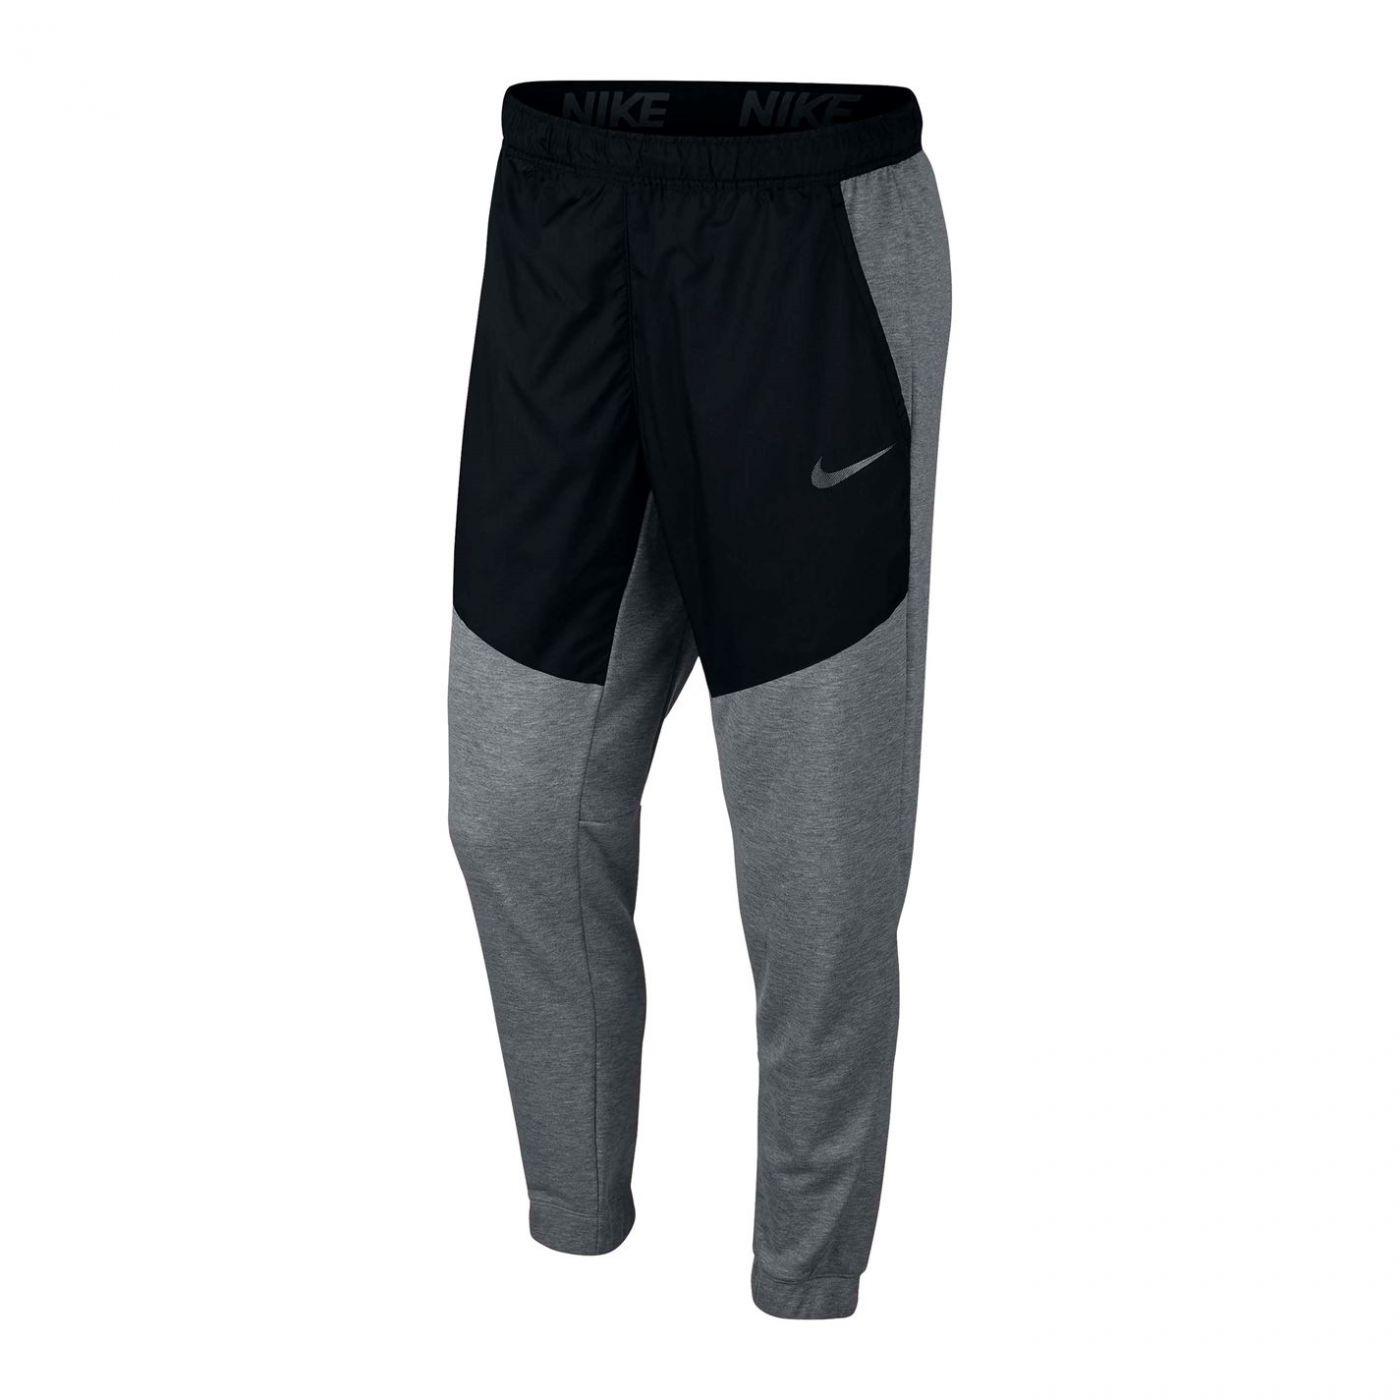 Nike Dry Fleece Training Pants Mens